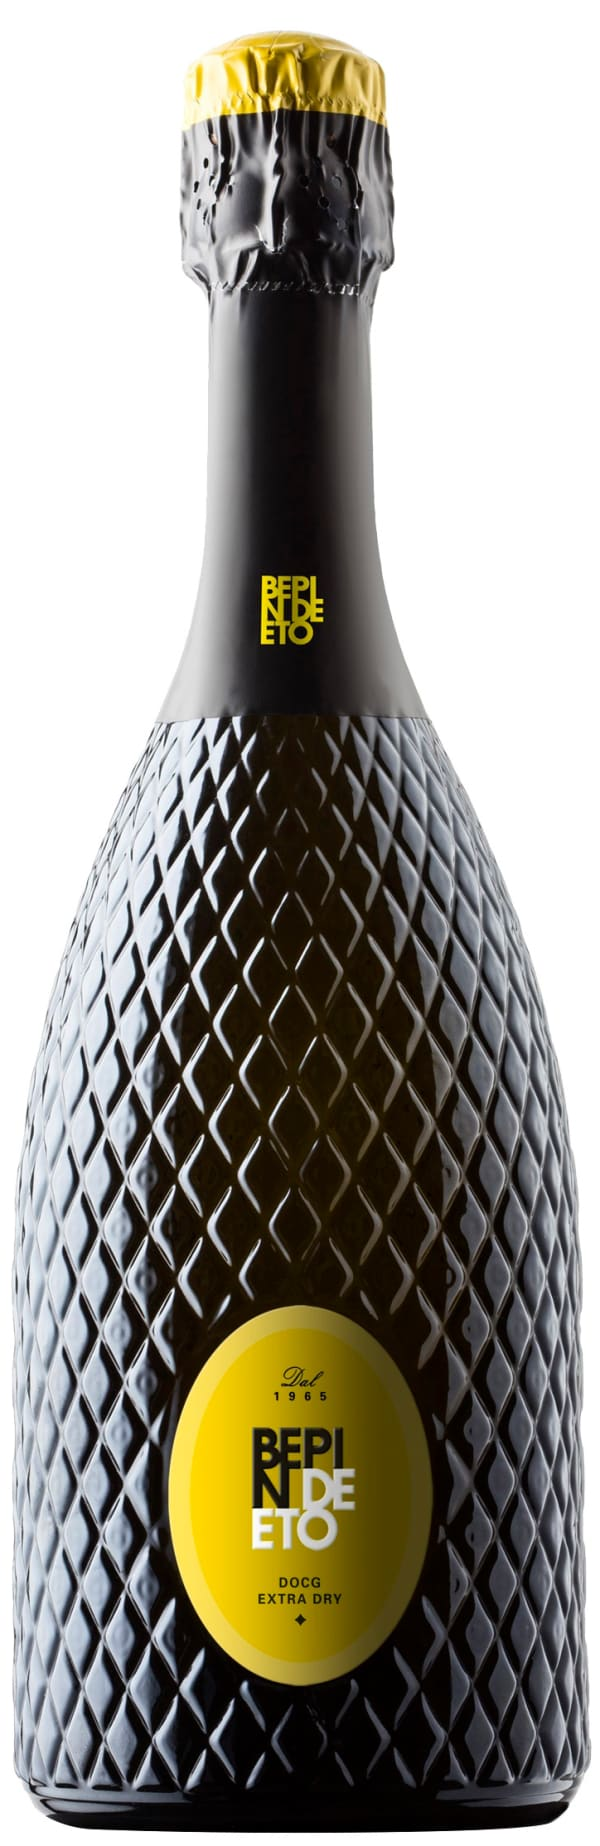 Bepin de Eto Prosecco Extra Dry 2016